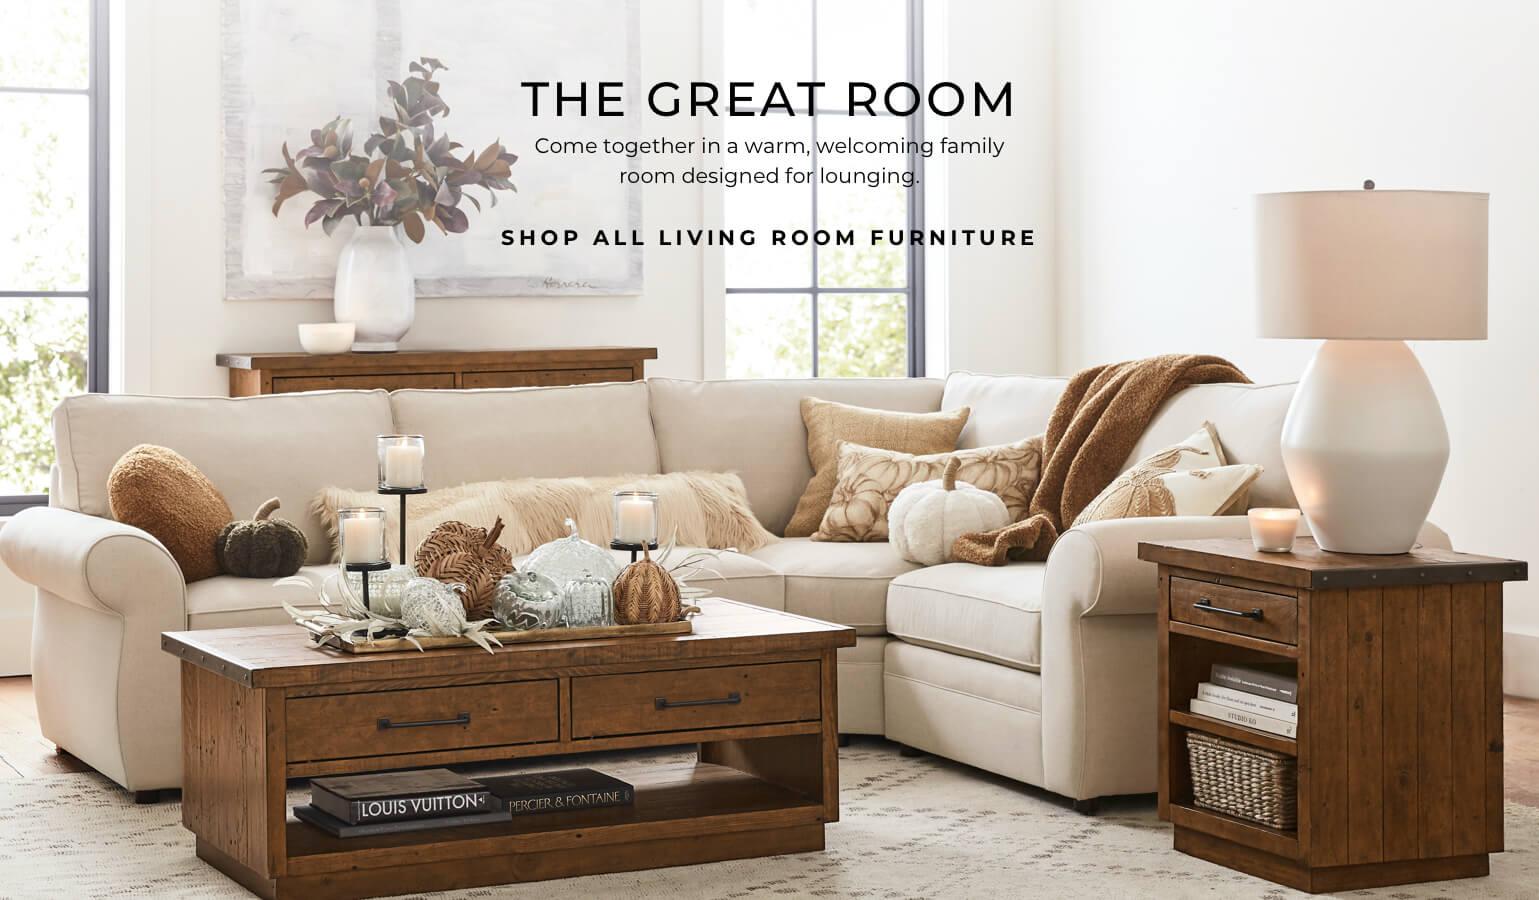 Pottery Barn UAE  Shop Home Accessories, Furniture, Home Decor & More